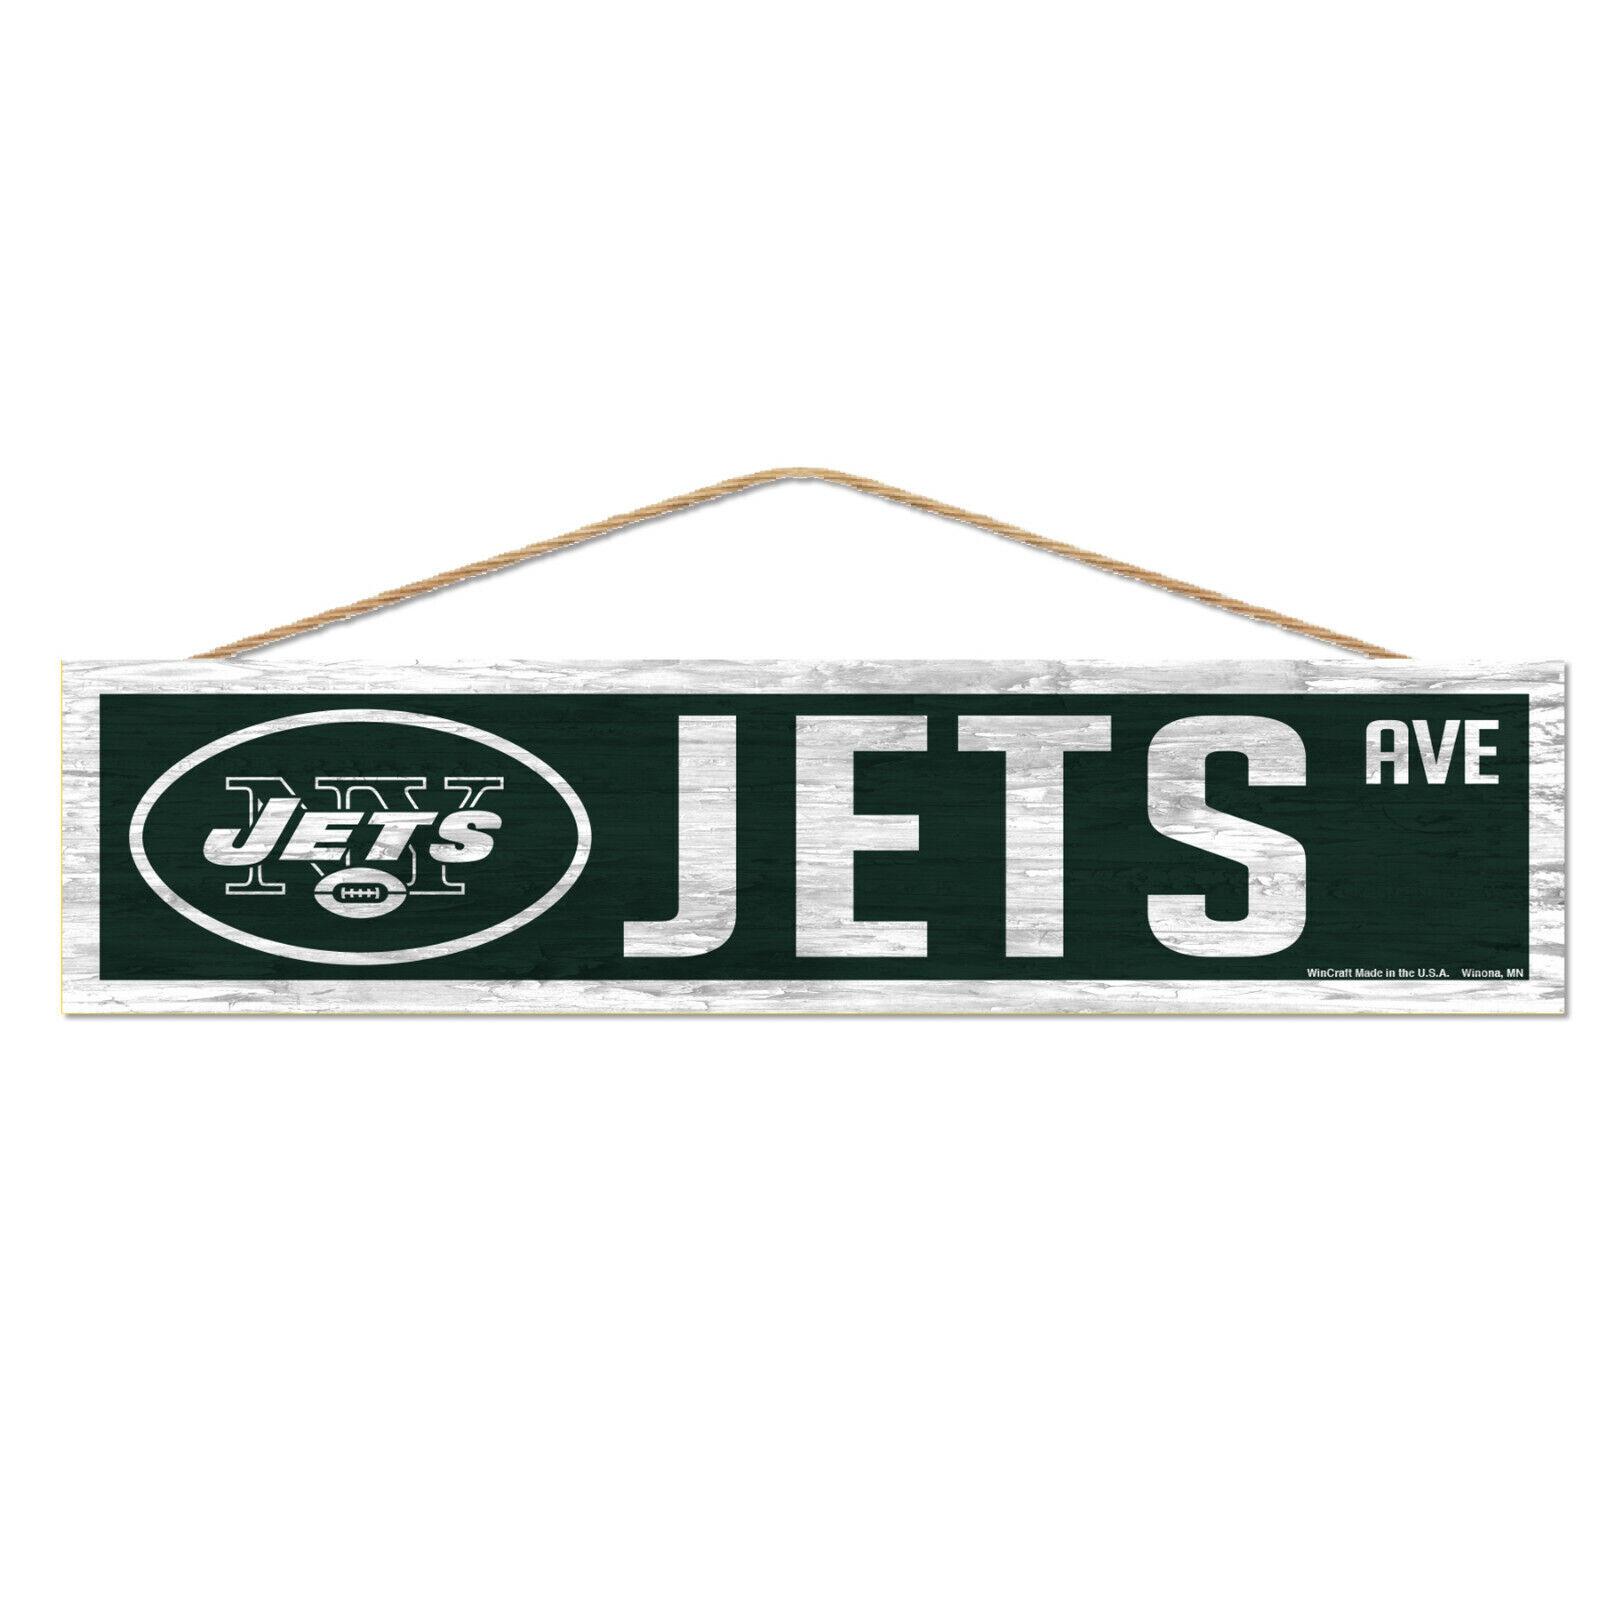 NFL New York Jets NY Avenue Wood Sign Holzschild Holz Wandschmuck Deko